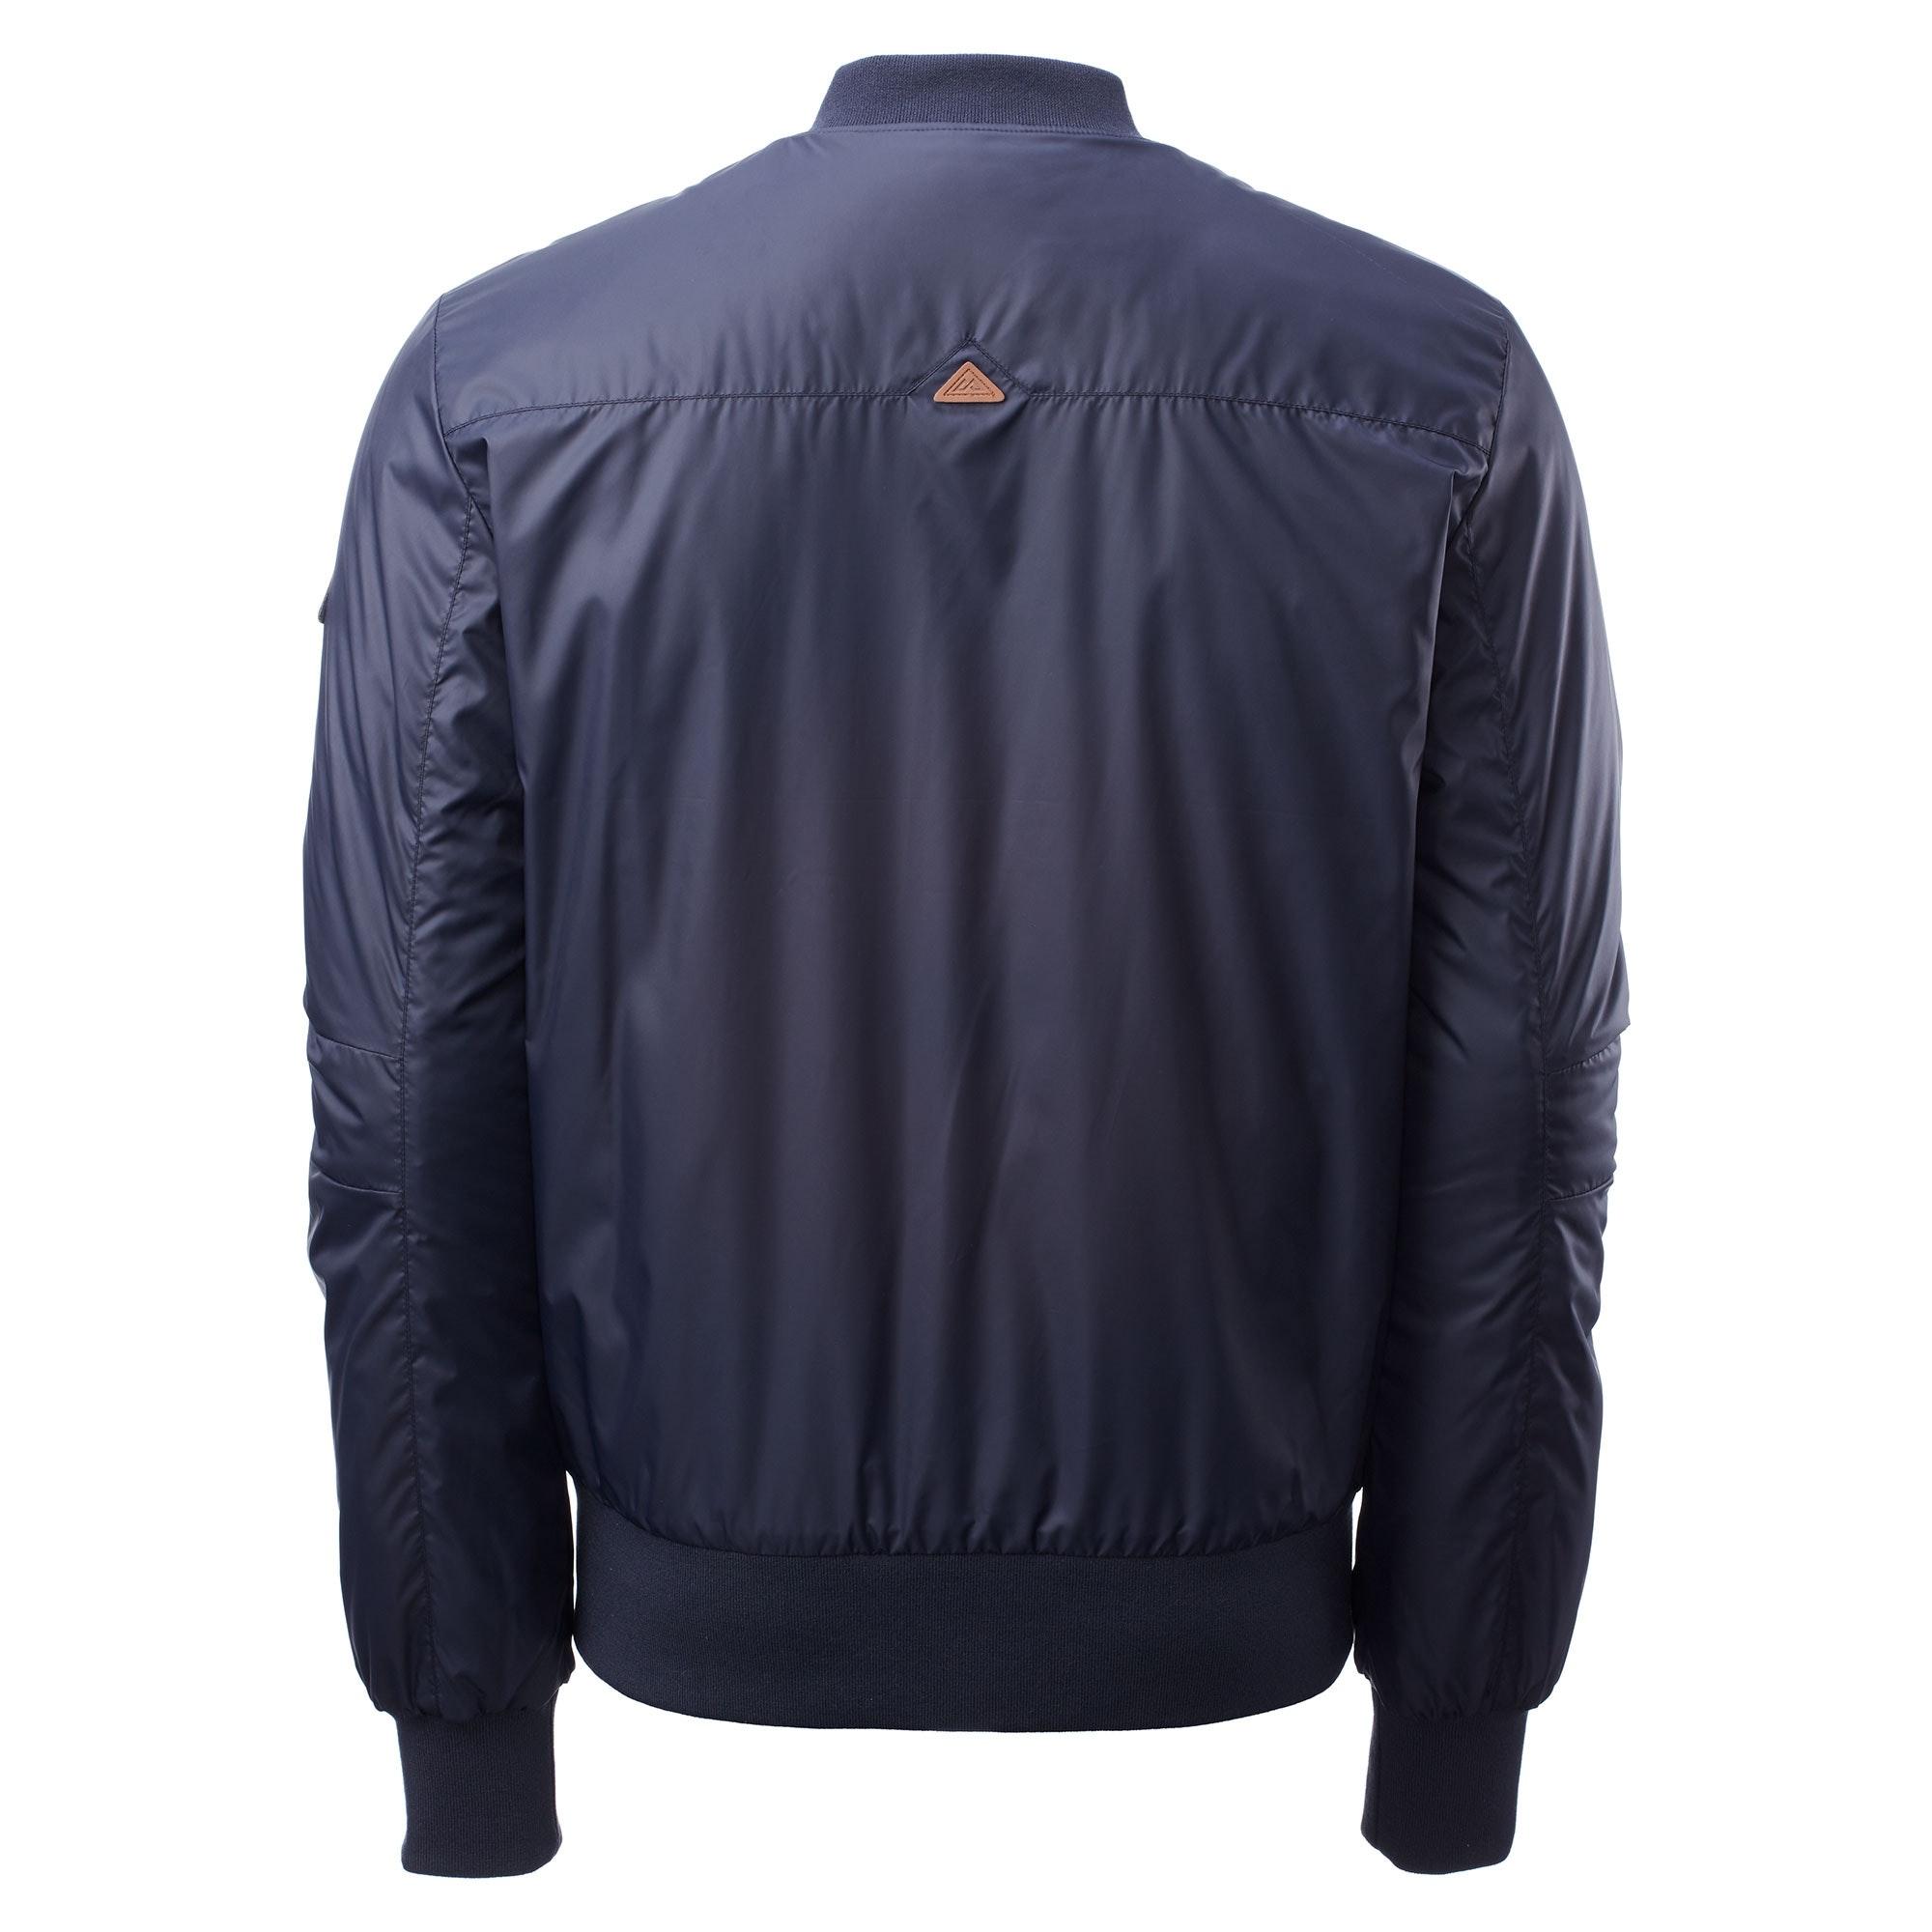 Kathmandu-Contender-Insulated-Water-Repellent-Lightweight-Men-039-s-Bomber-Jacket